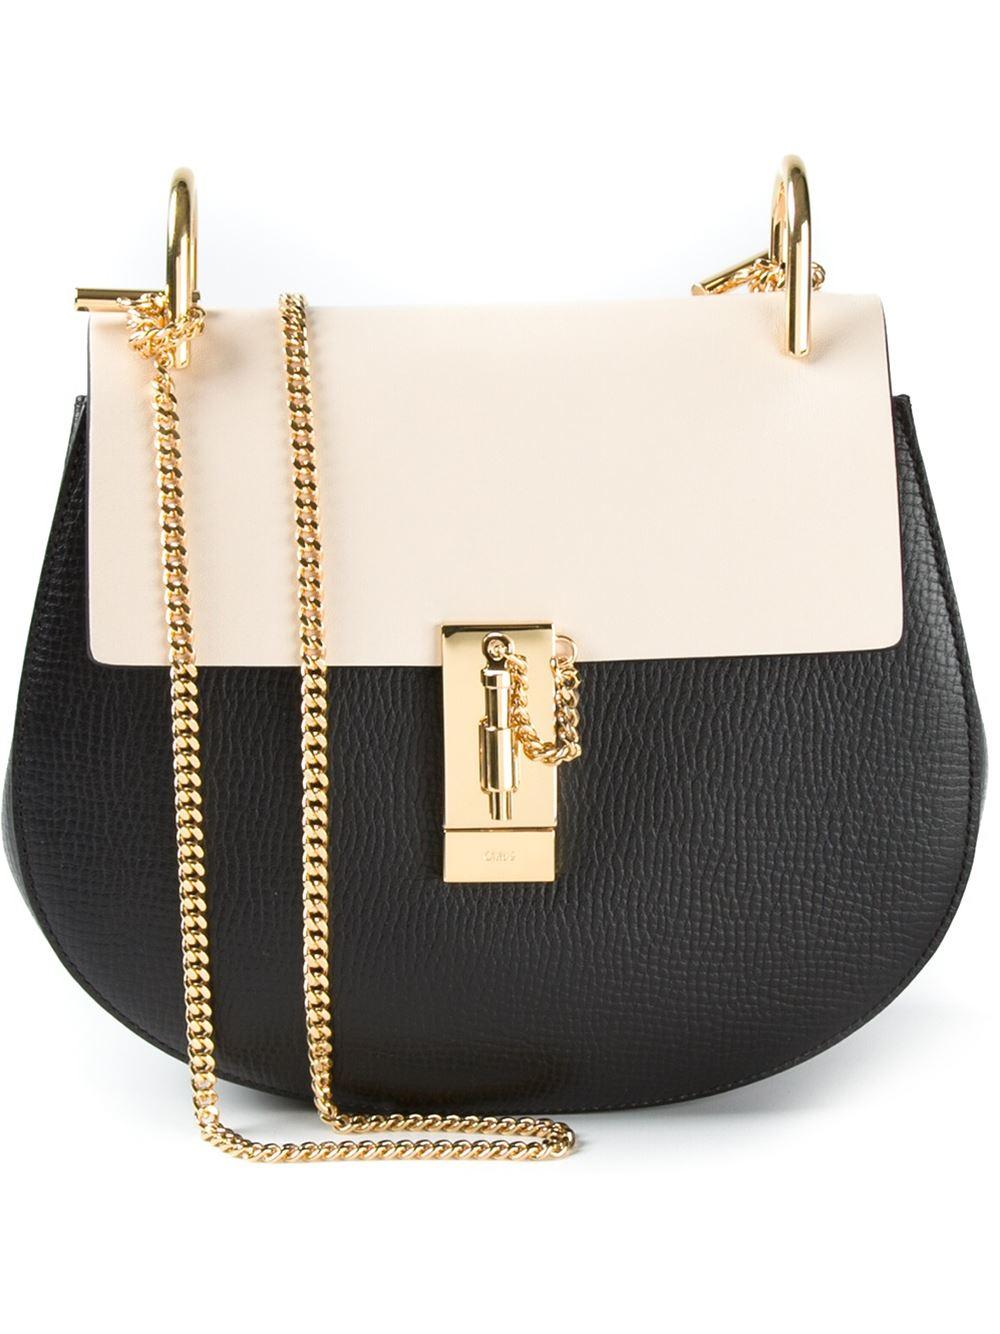 Chloe Drew Bag large